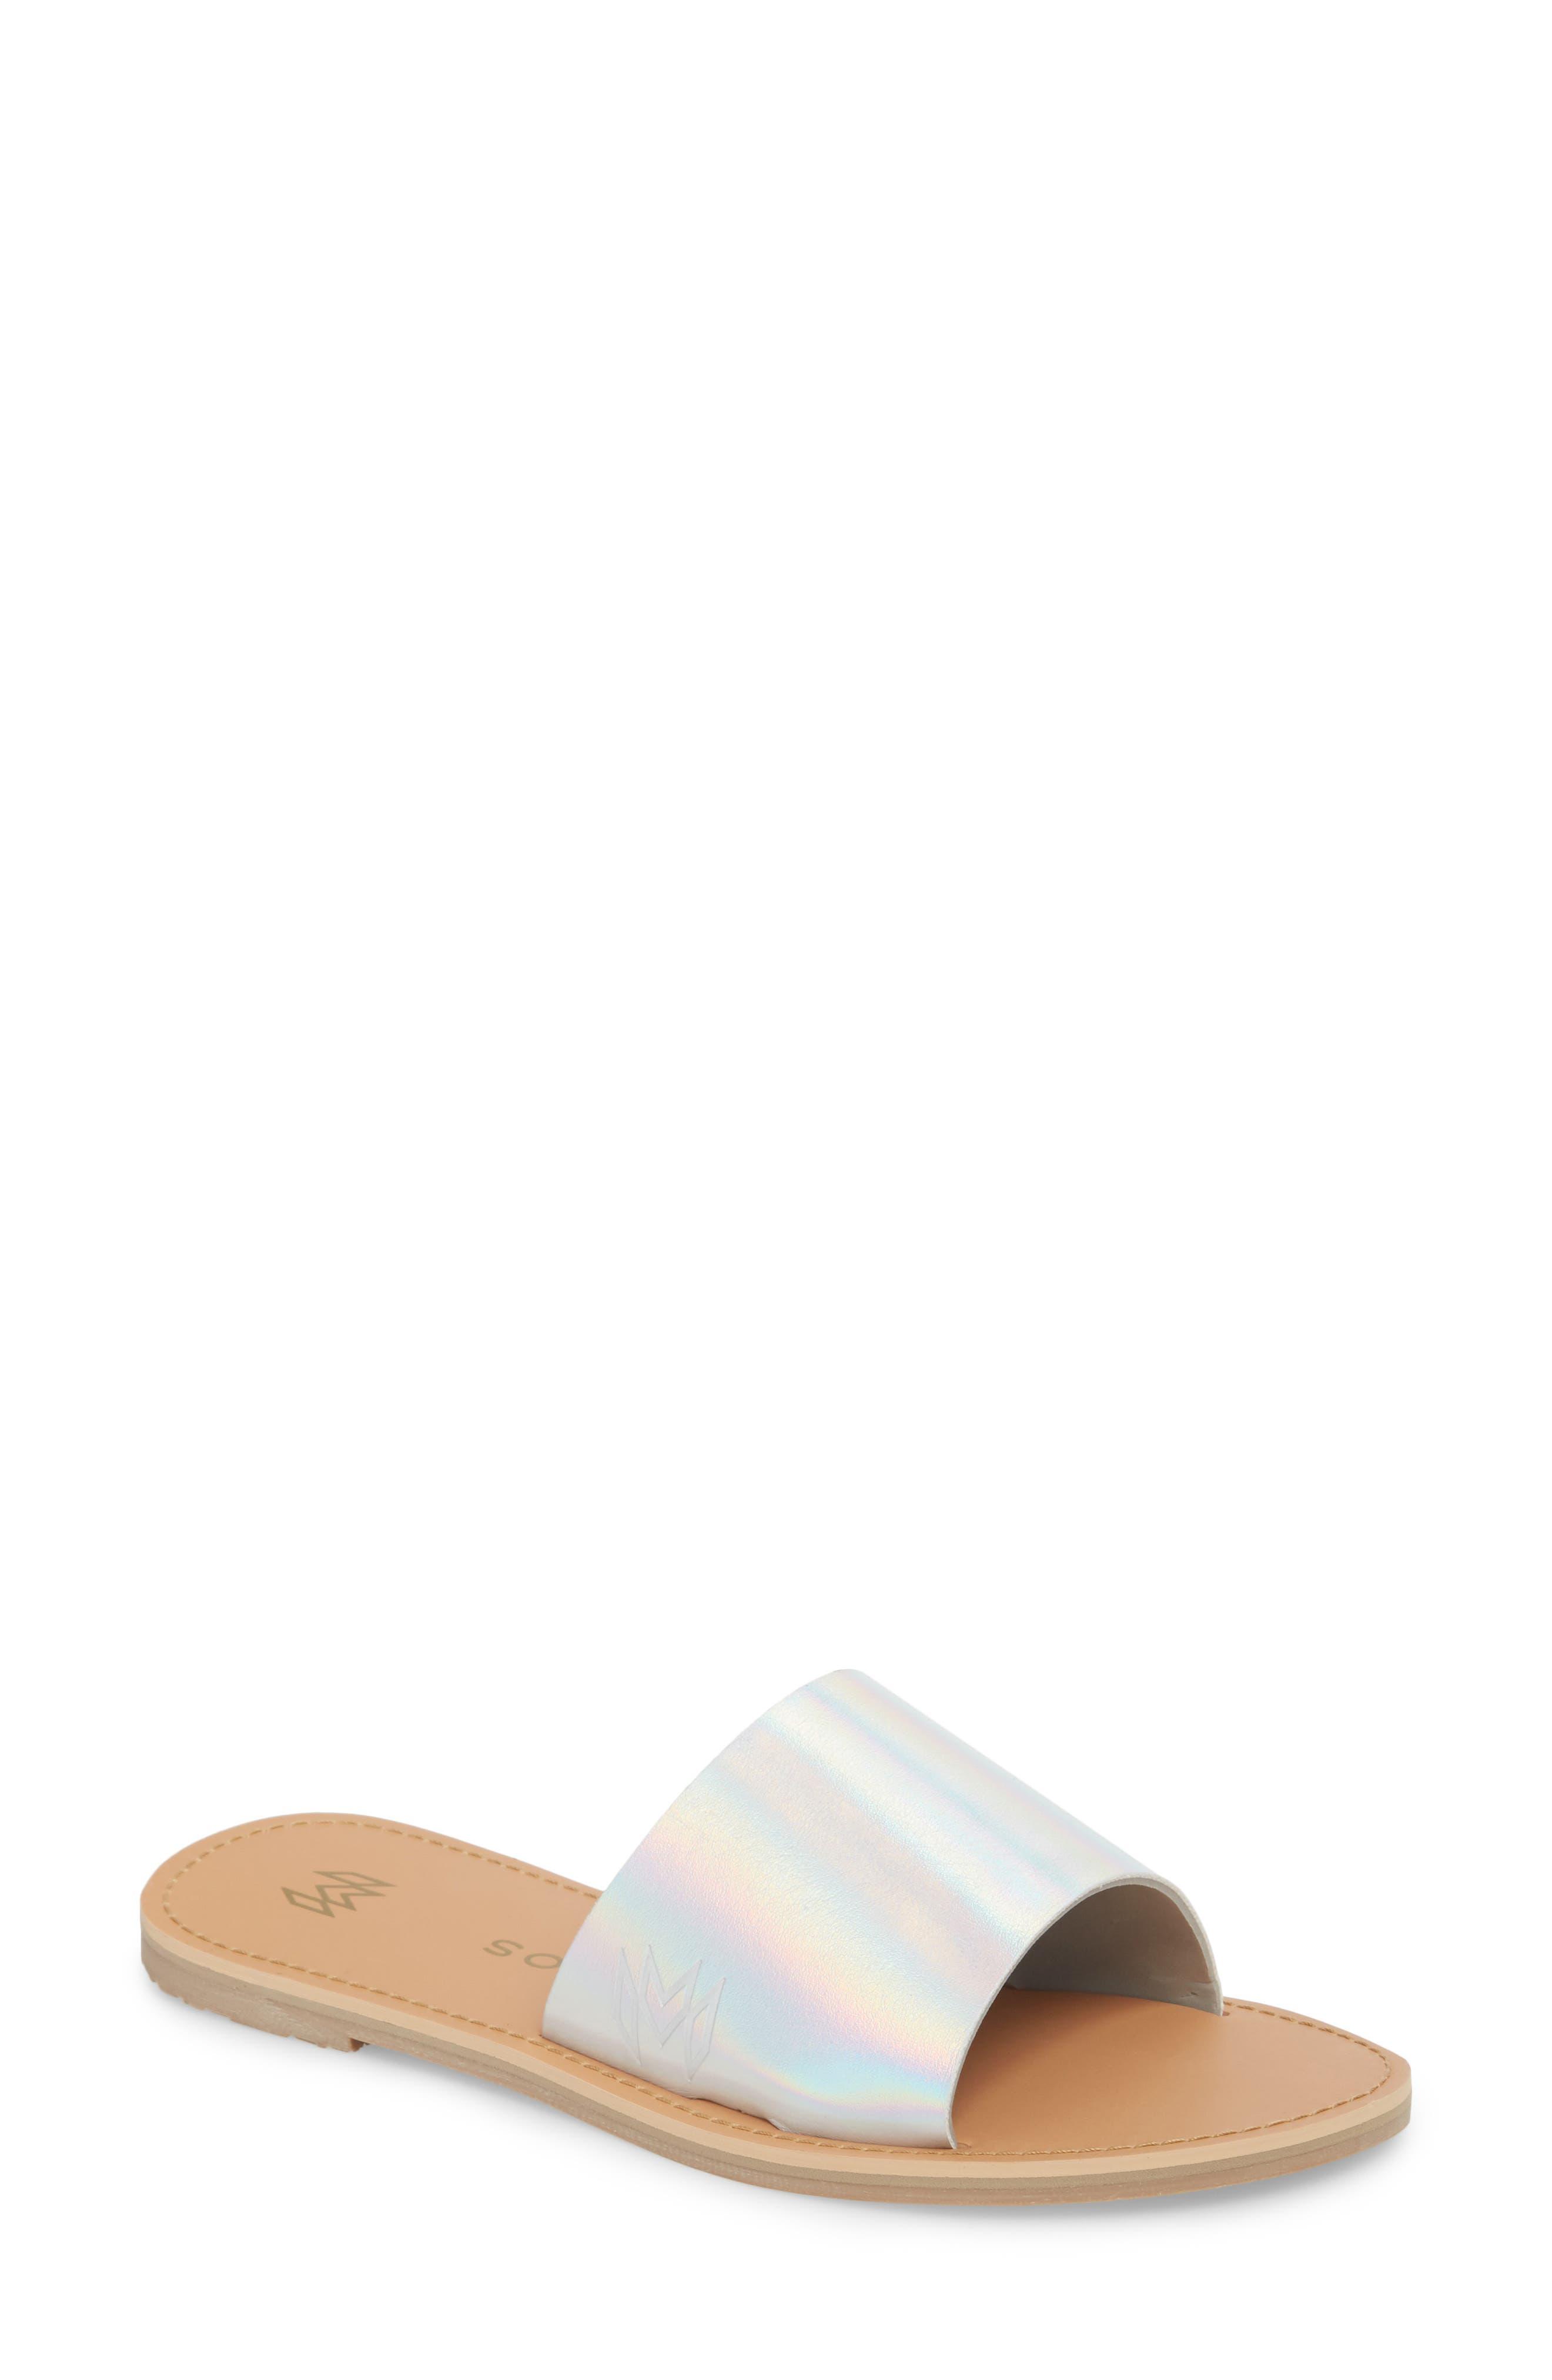 Icon Taylor Slide Sandal,                         Main,                         color, PLATINUM